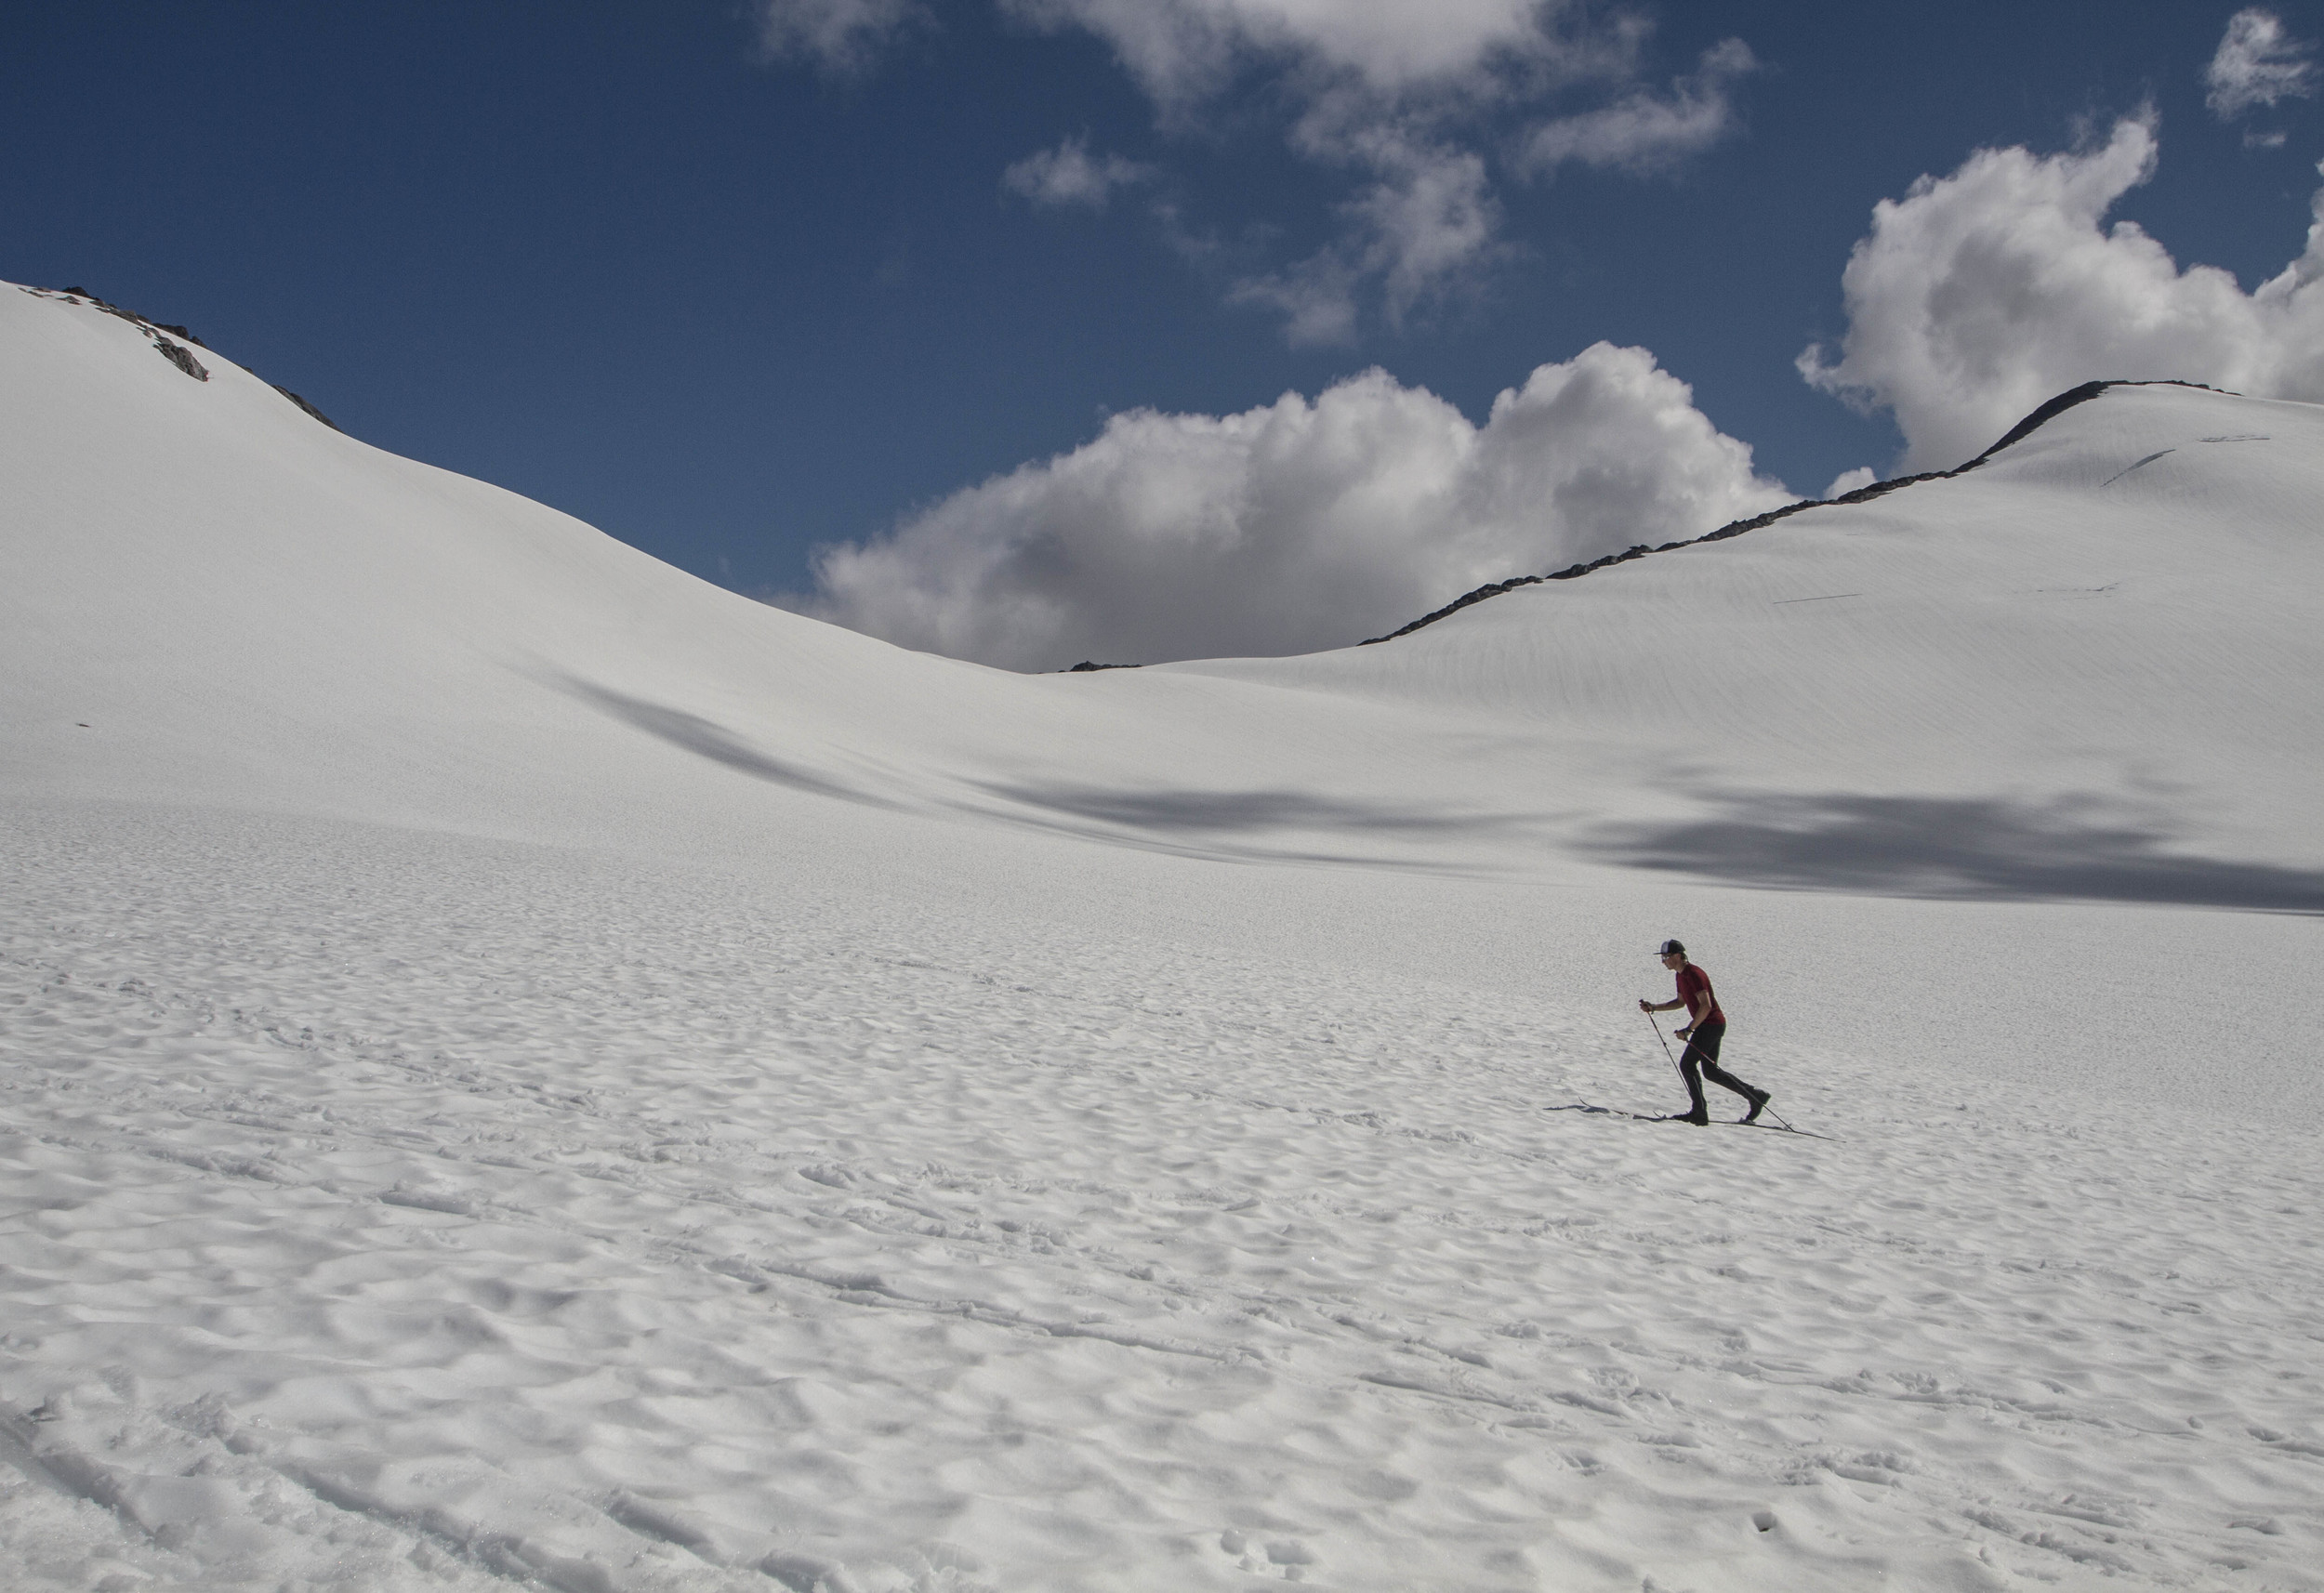 JIRP student Grayson Carlile takes advantage of a sunny day with some ski practice on Lemon Creek Glacier. Photo: Adam Taylor